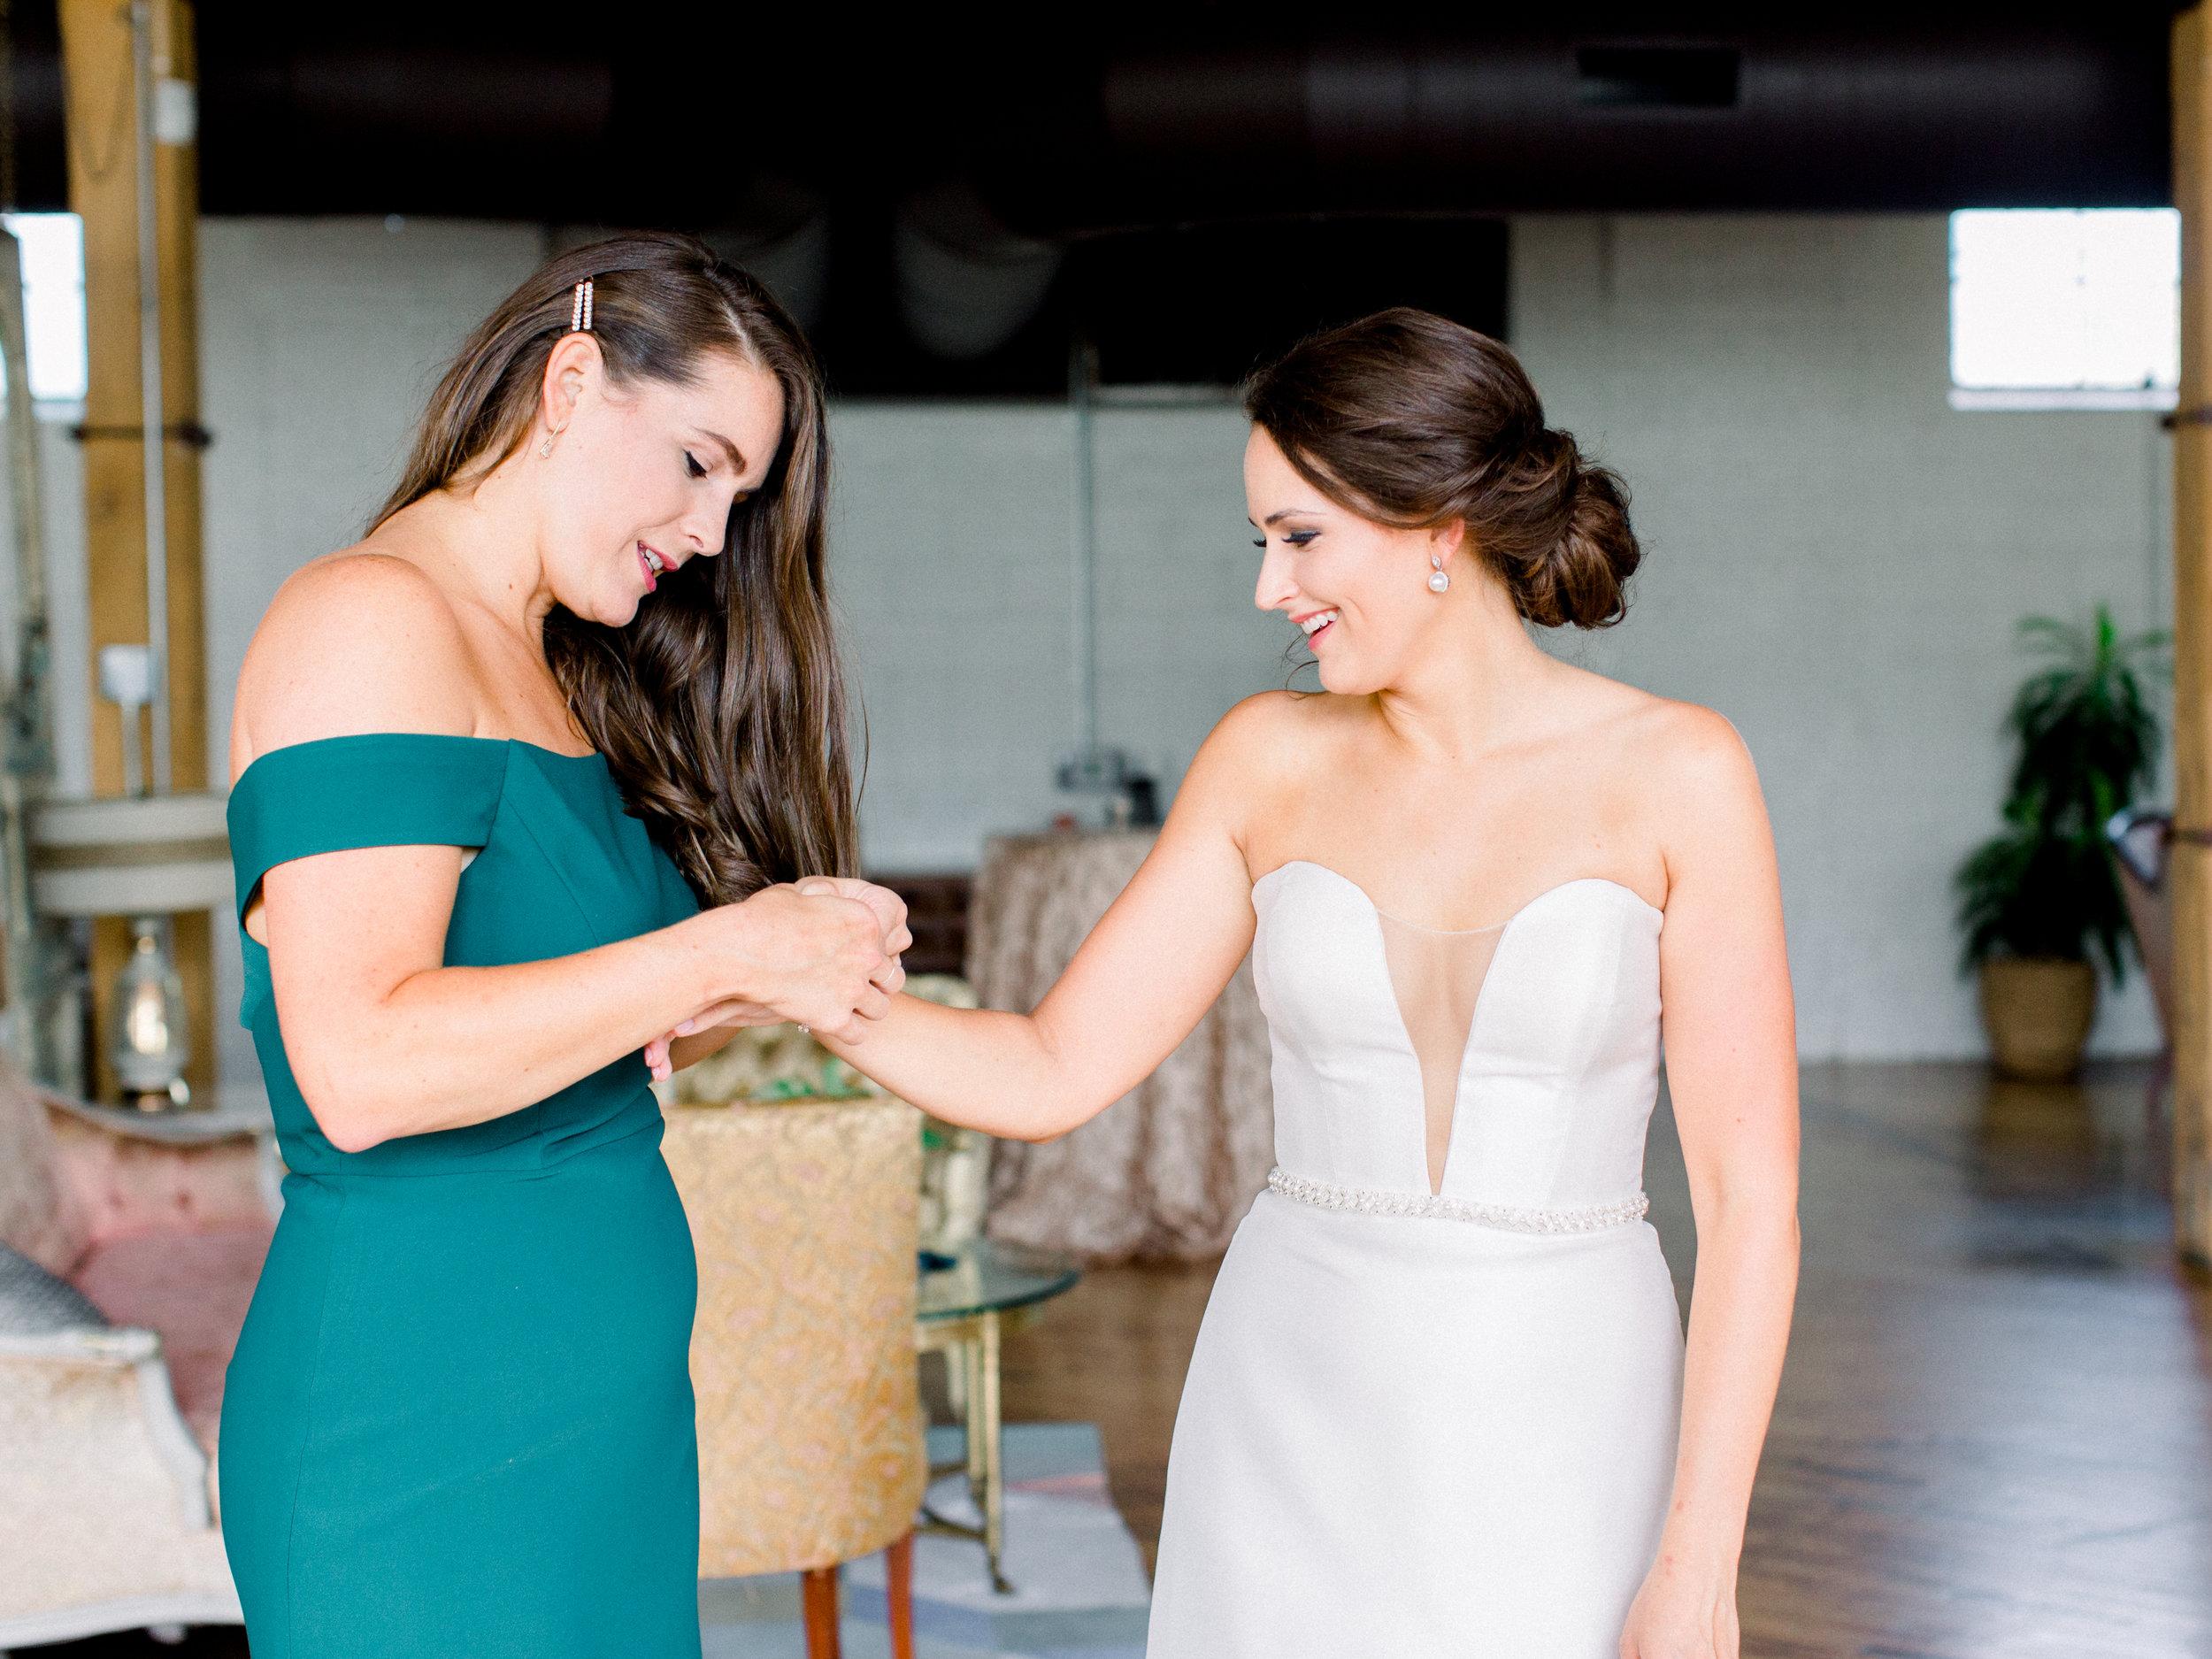 Steiner+Wedding+Bride+Getting+Dressed-33.jpg